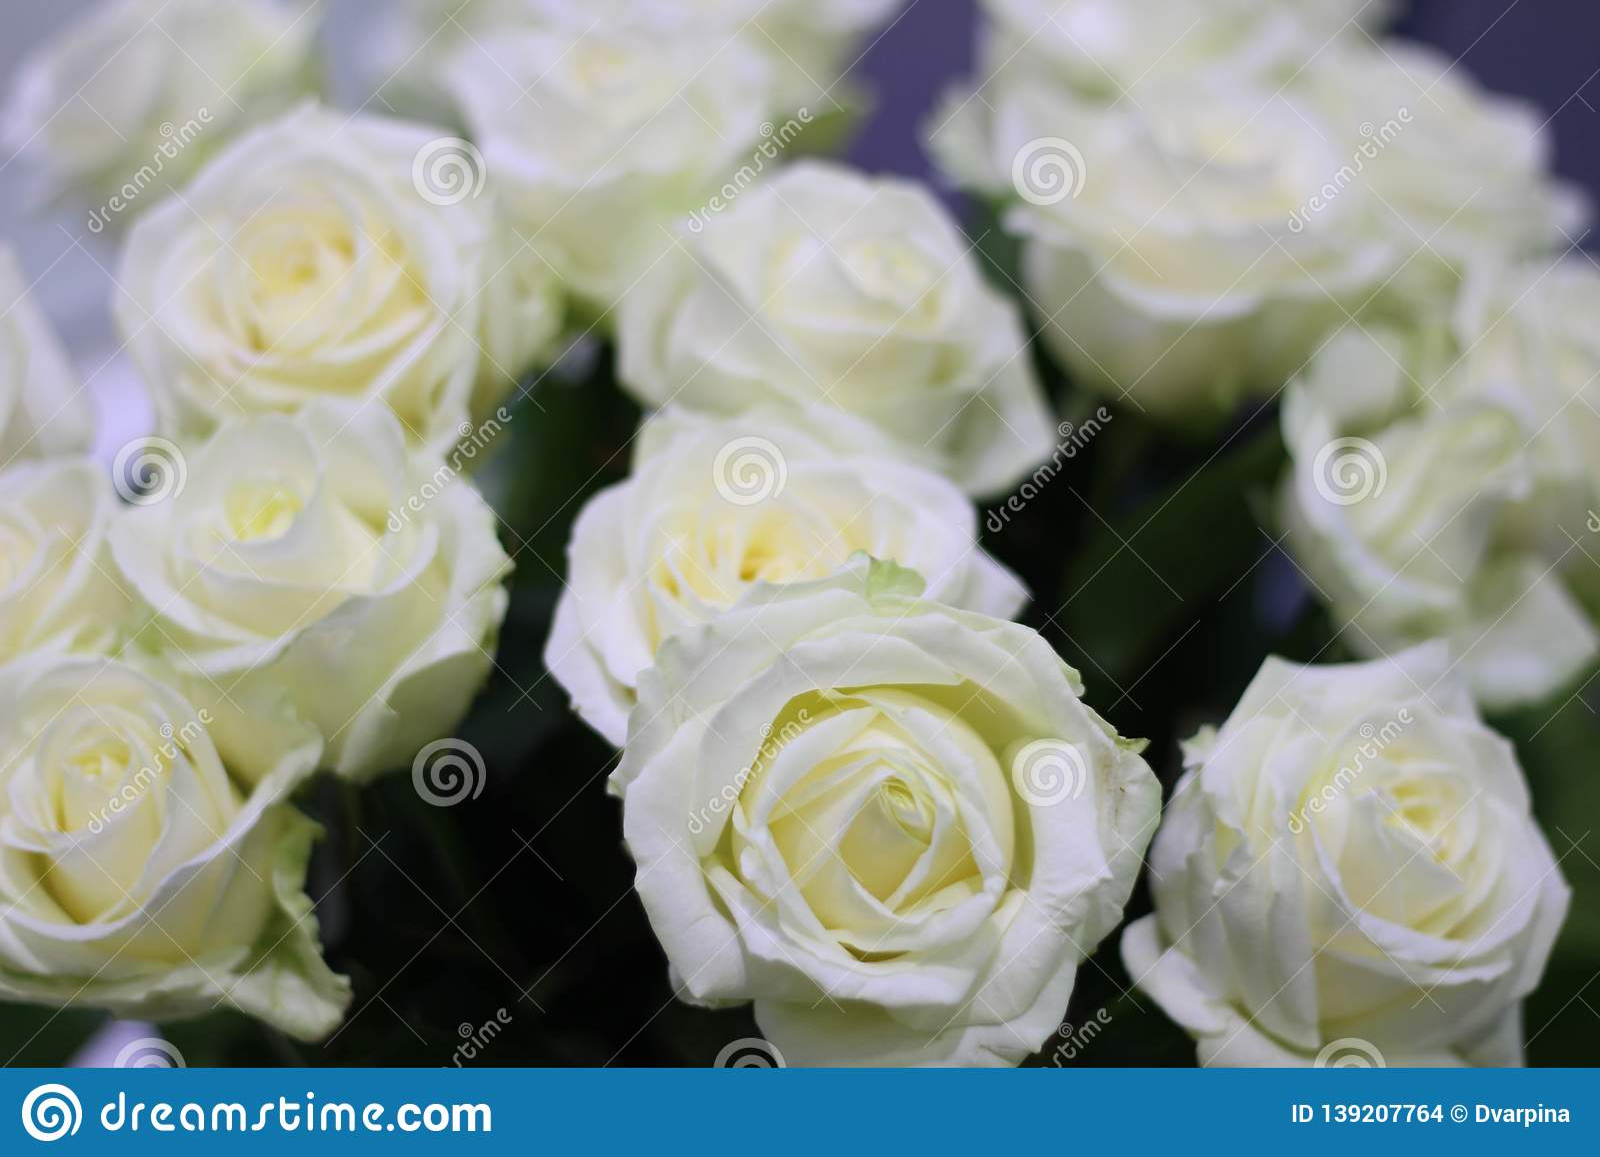 White rose dating site   Peninsula Dance Academy